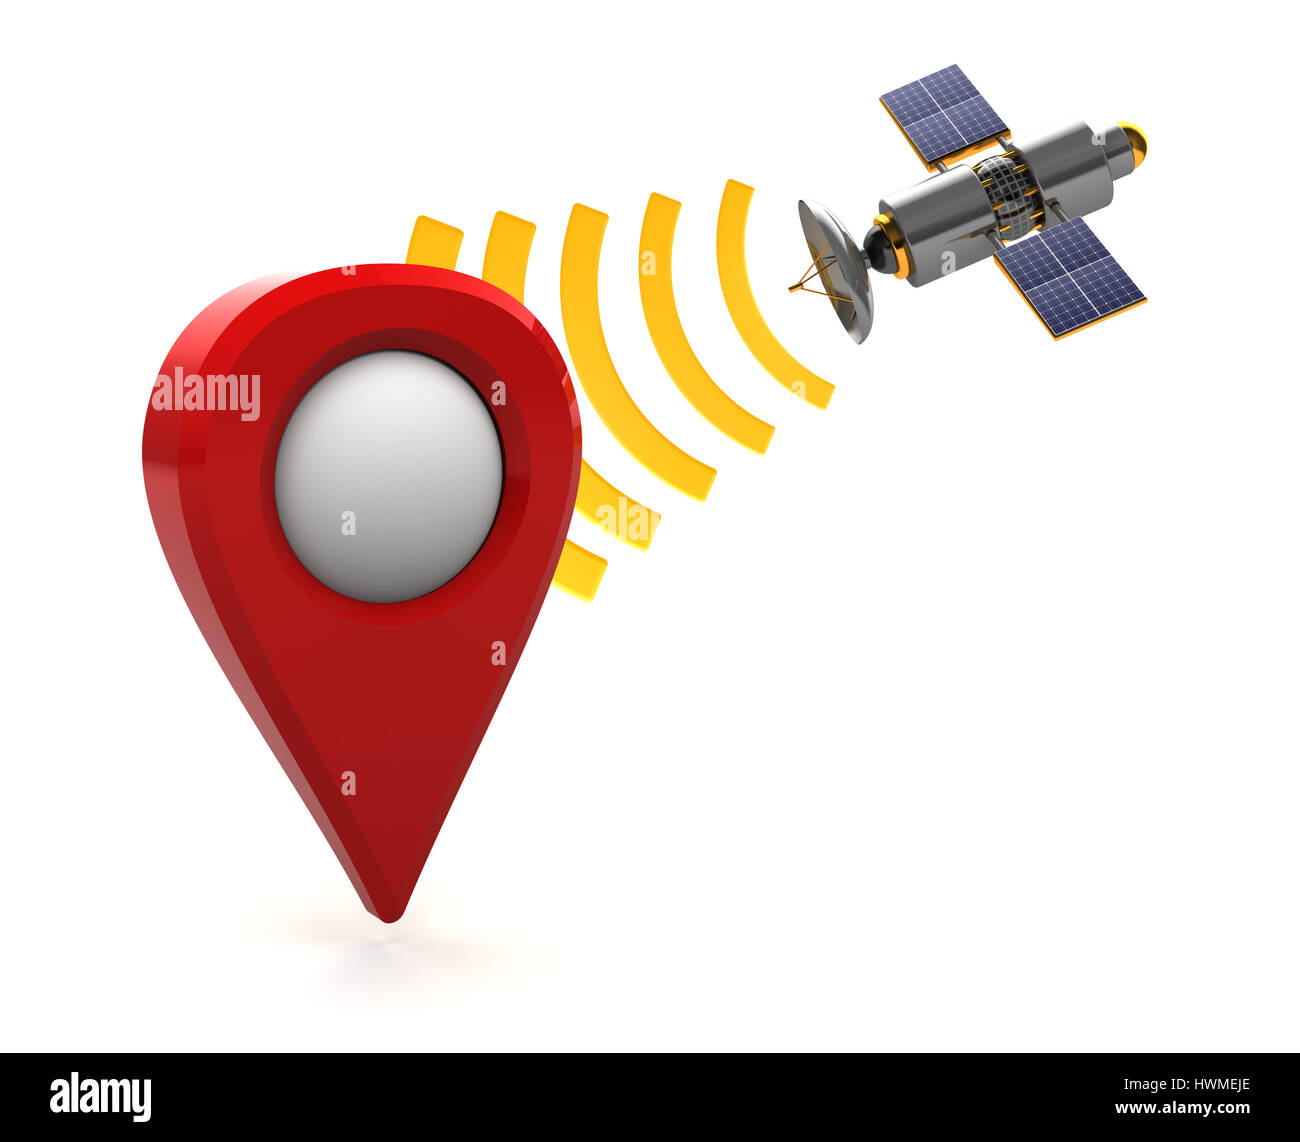 3d illustration of sattelite navigation concept, over white background - Stock Image